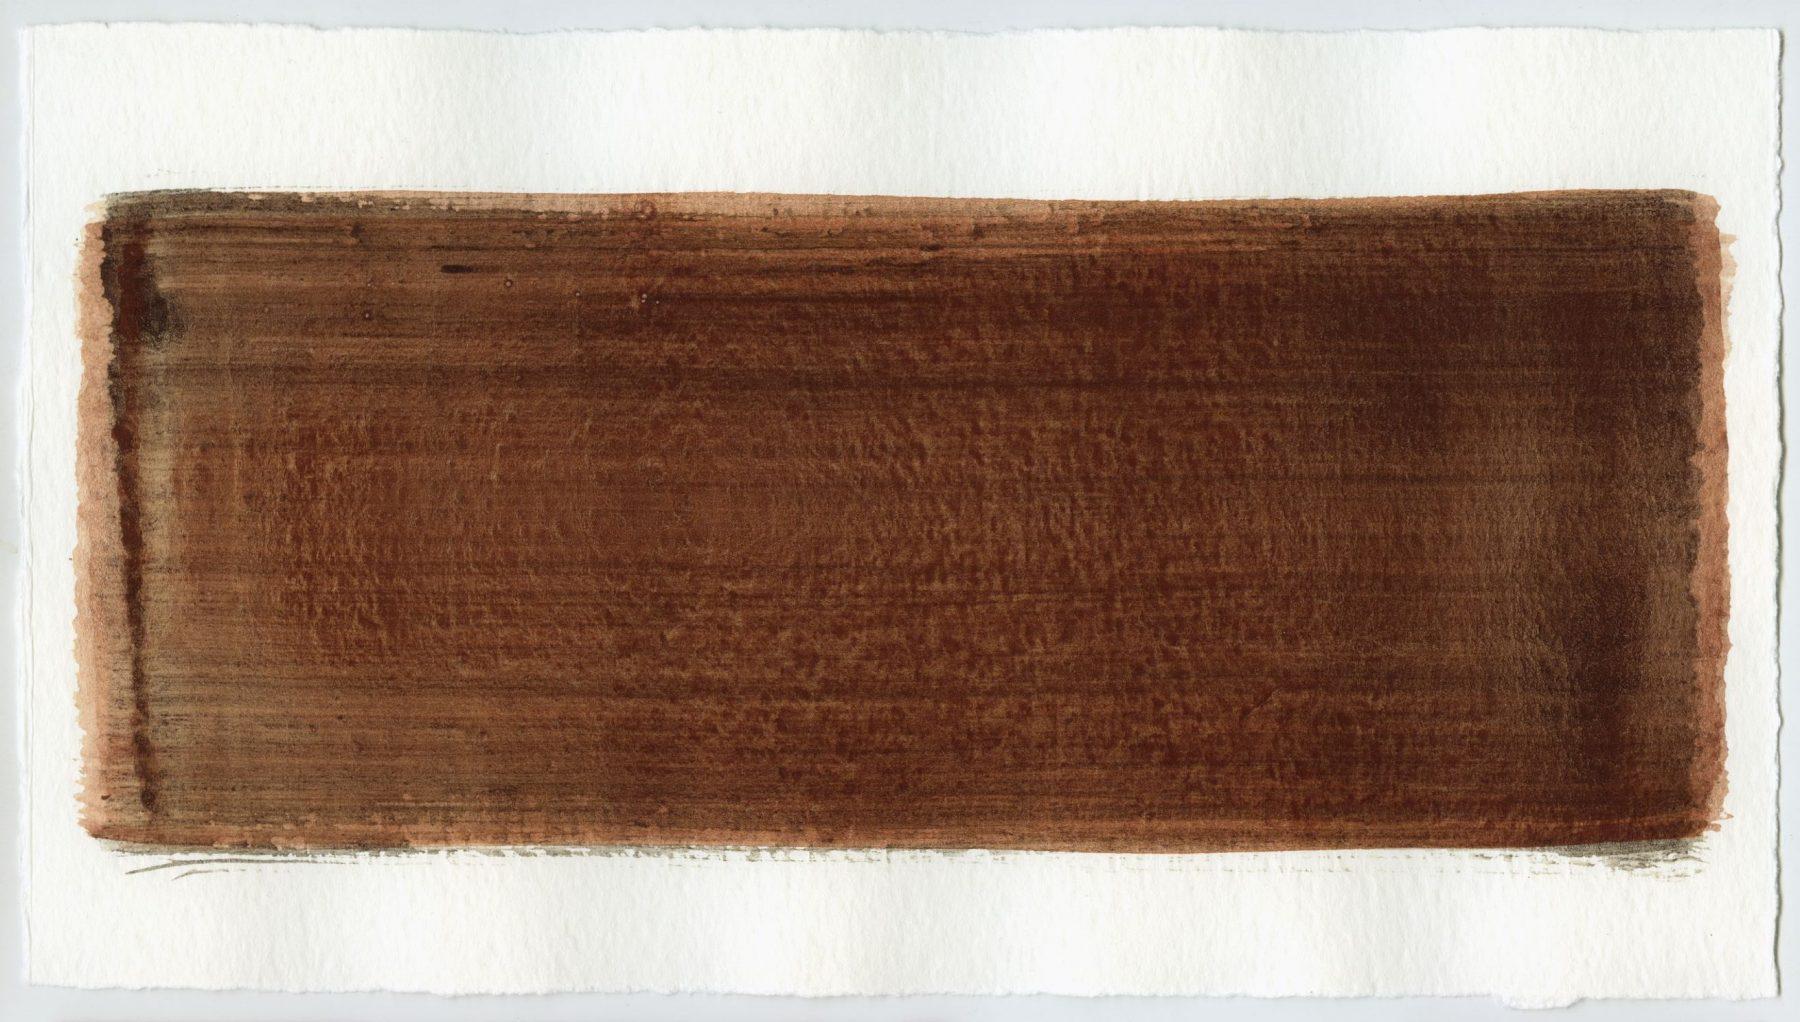 Brush stroke no. 101 - Selfmade pigment: Slingerpad bruin, IJzeroer gebrand